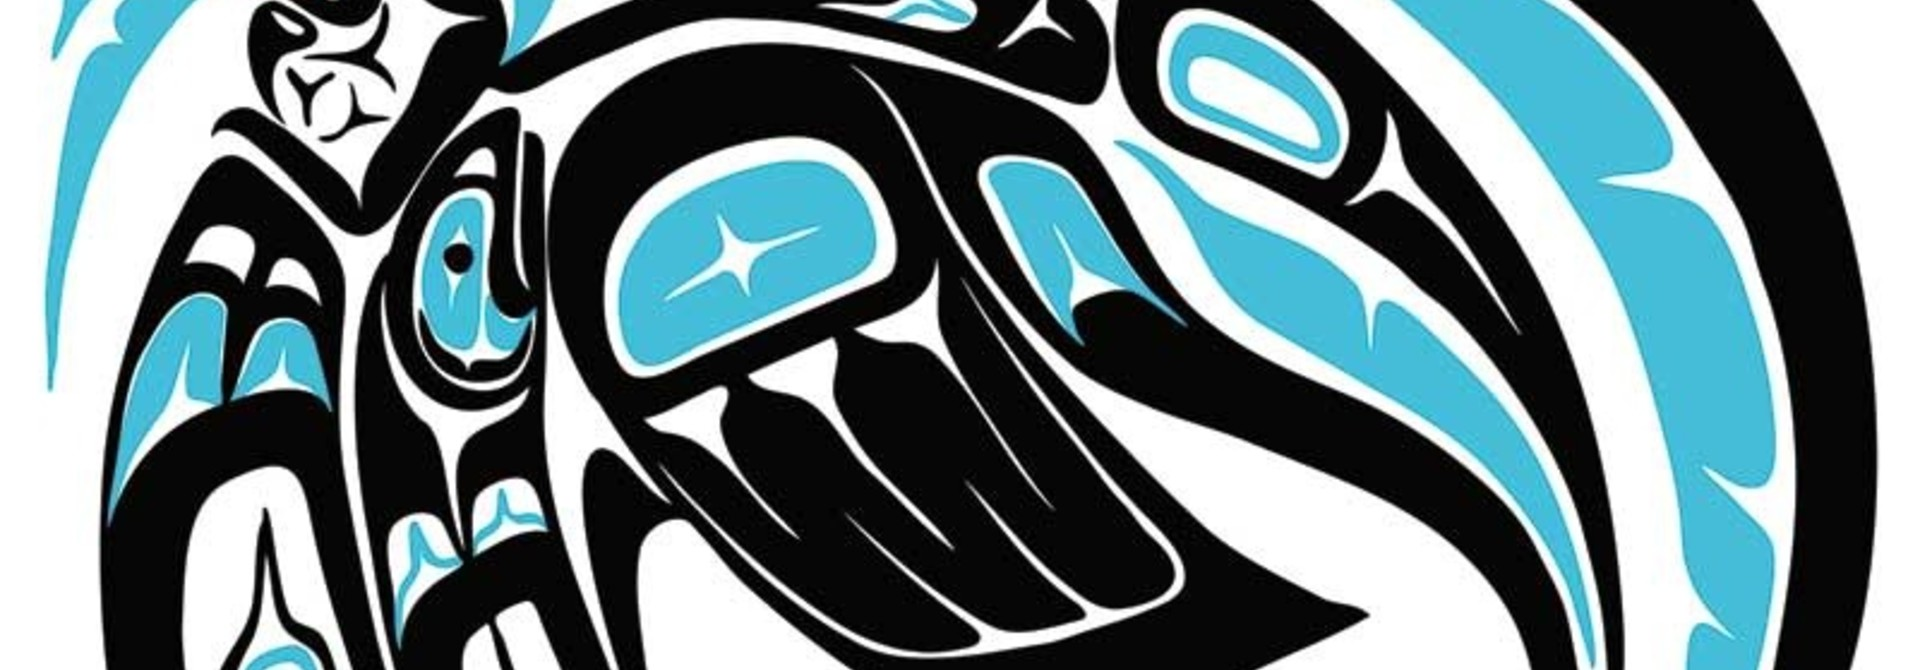 Killer whale-Jonathan Erickson